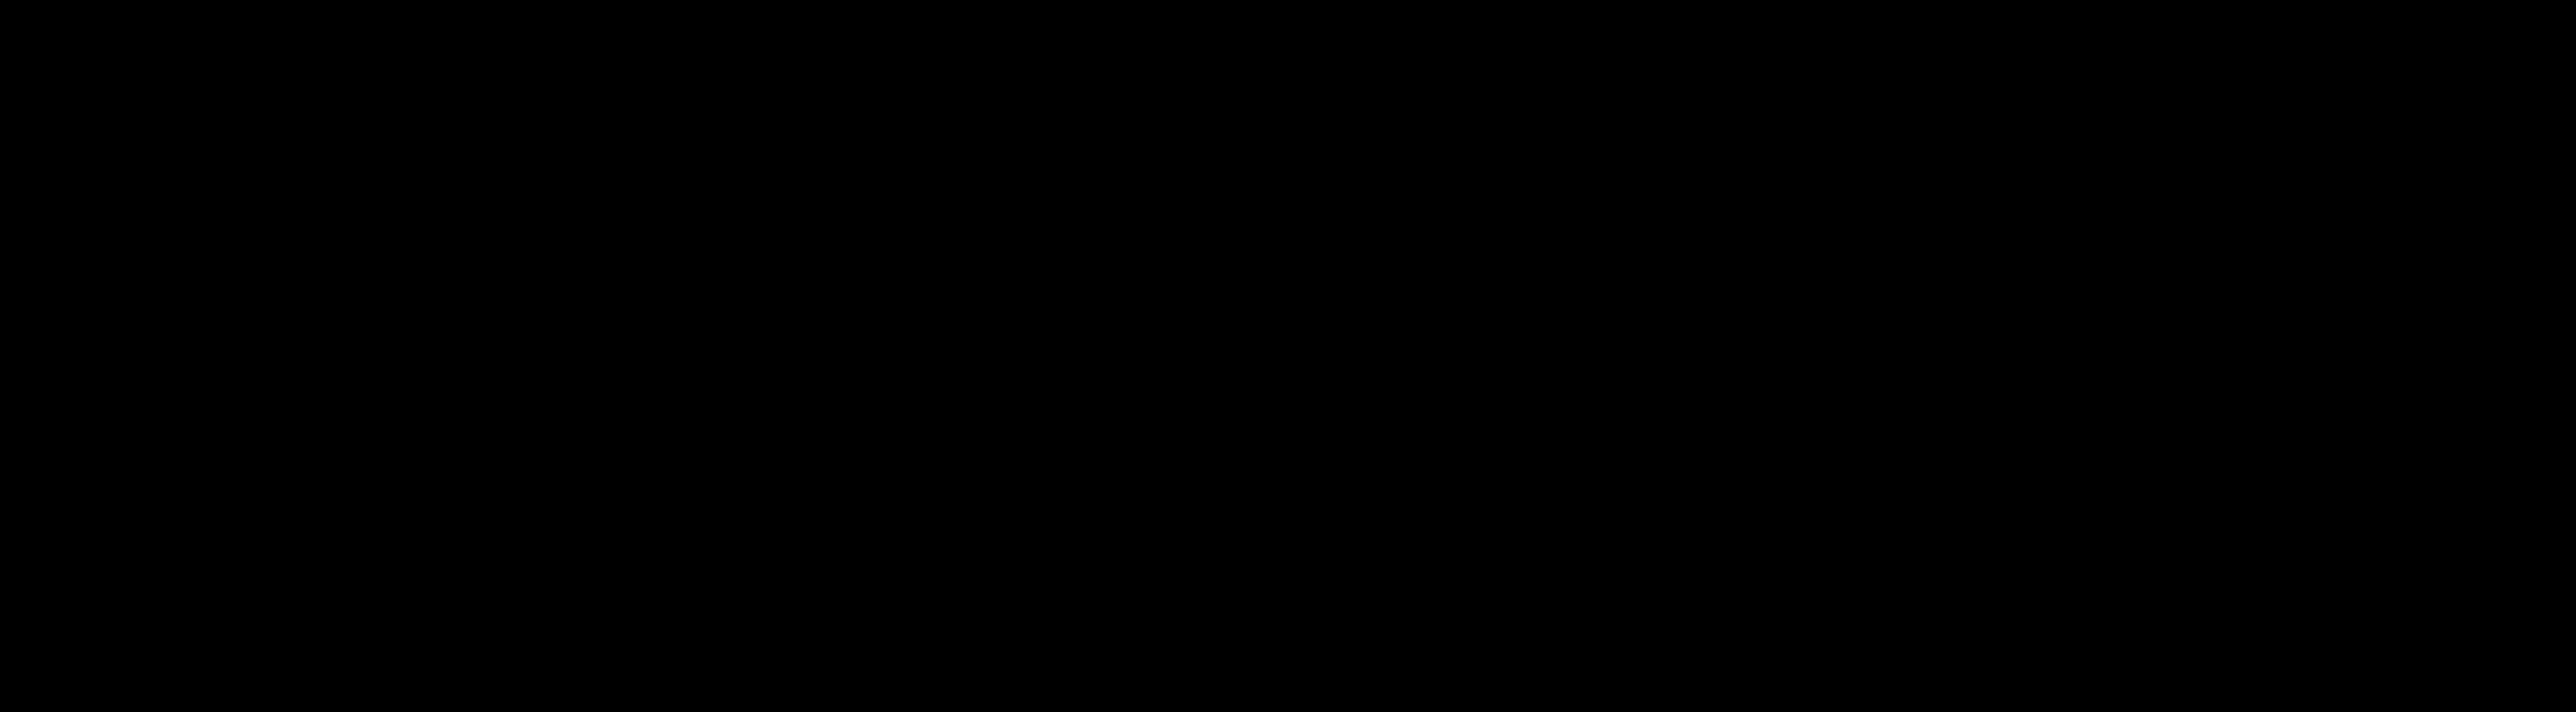 Barmariska